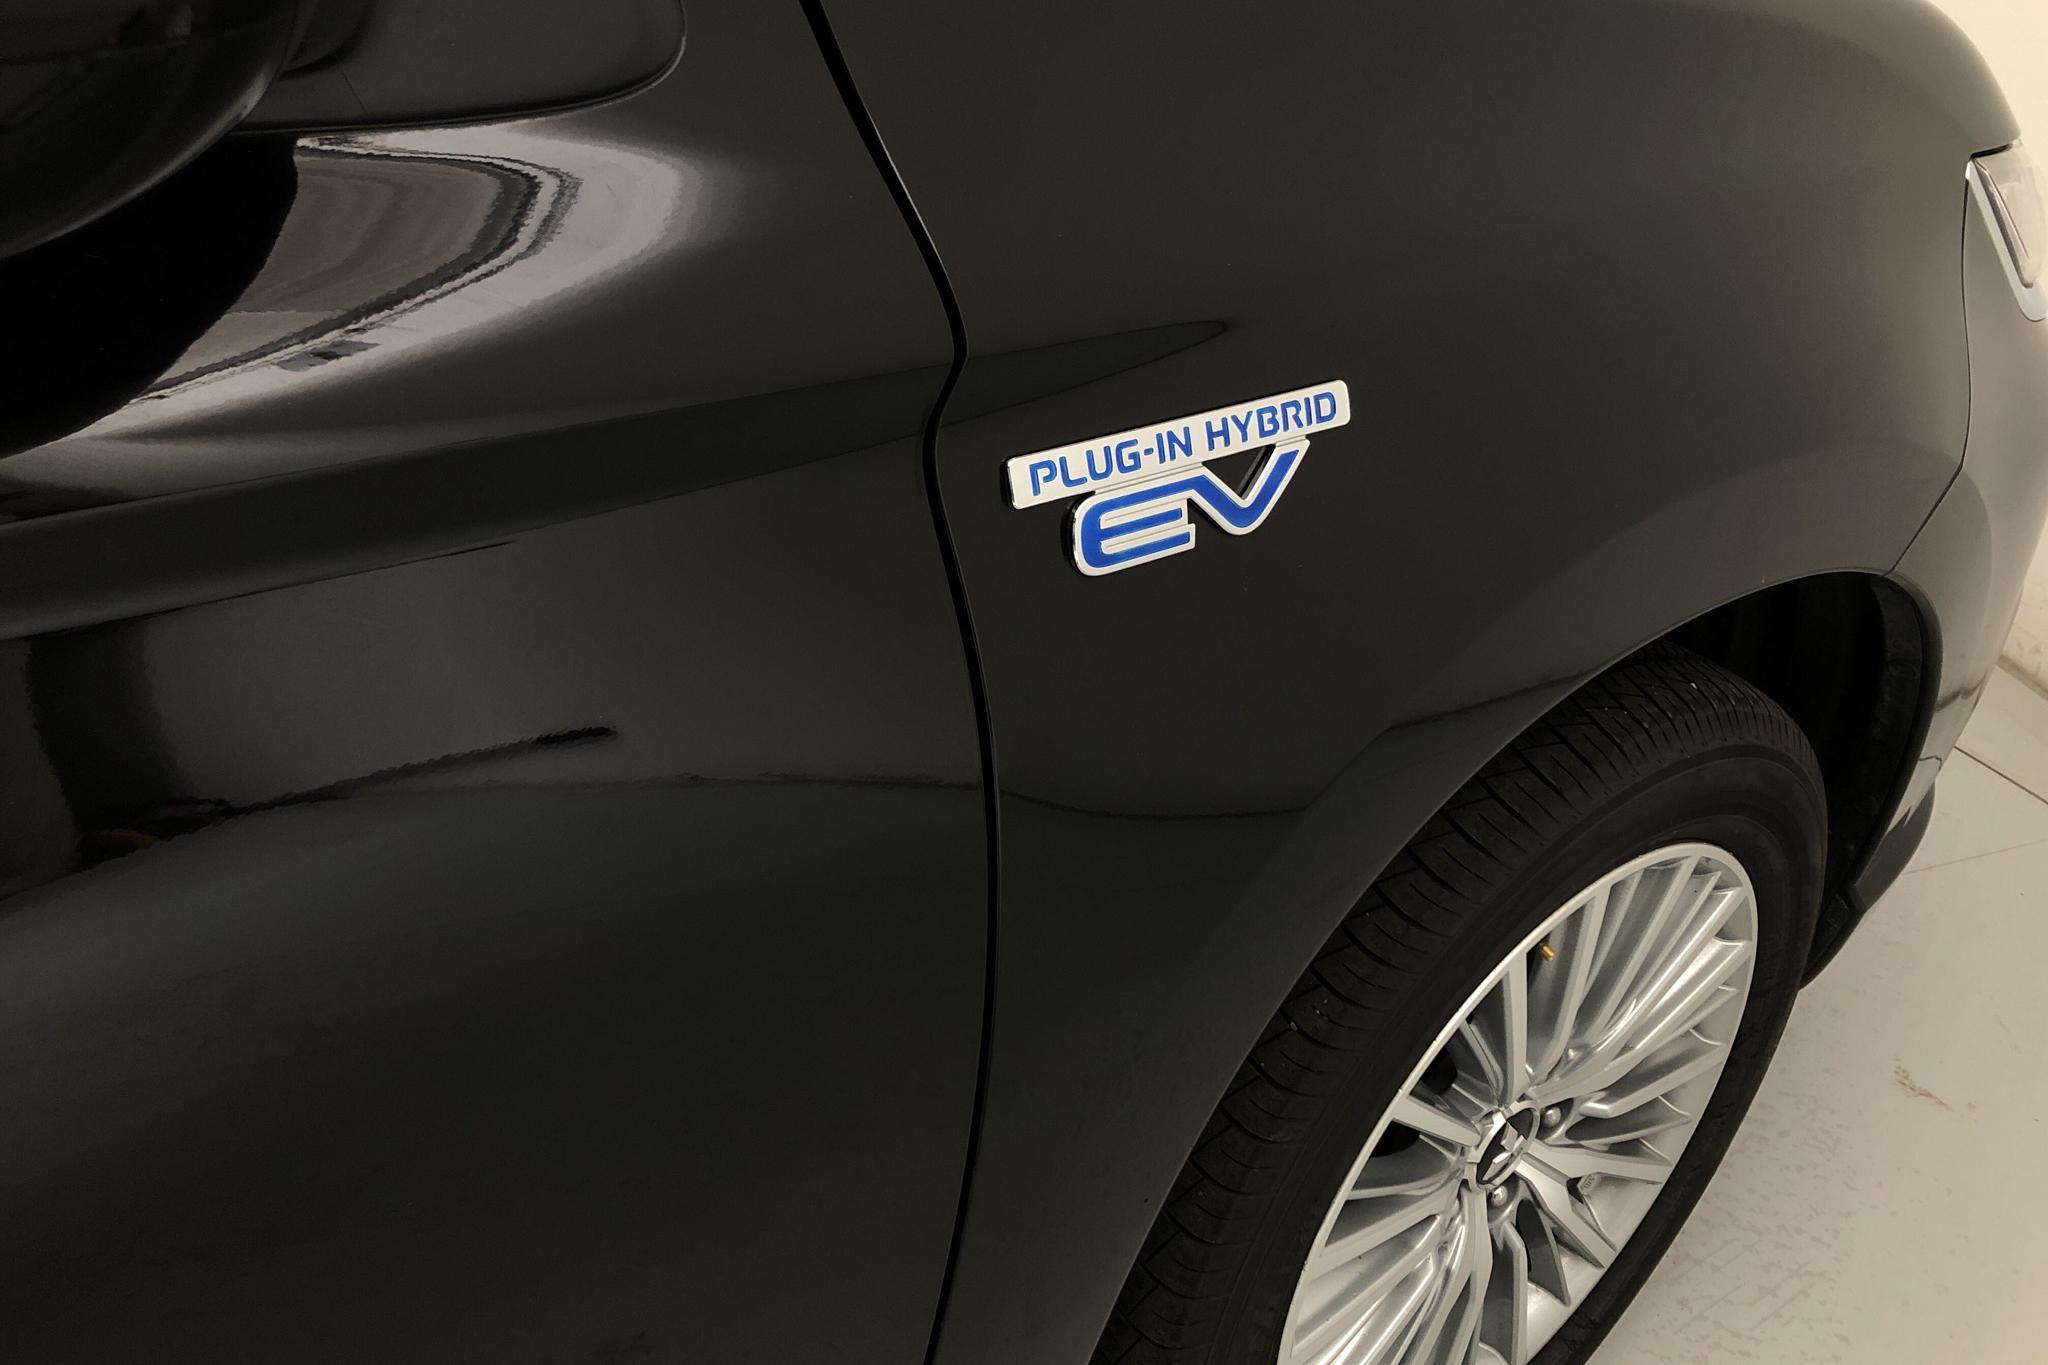 Mitsubishi Outlander 2.4 Plug-in Hybrid 4WD (136hk) - 32 360 km - Automatic - black - 2019